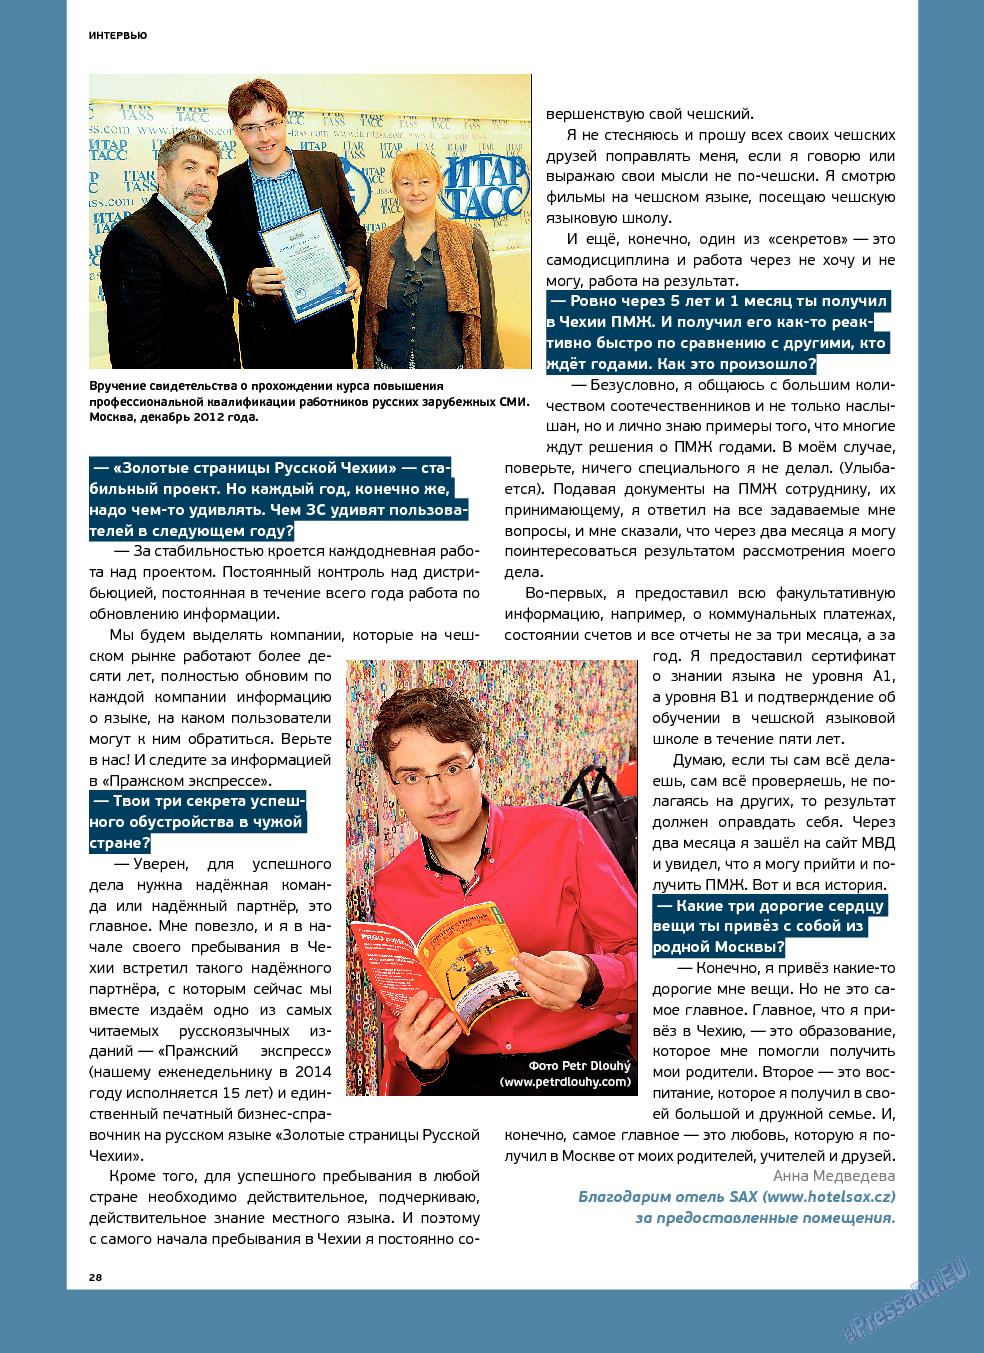 Артек (журнал). 2013 год, номер 5, стр. 30